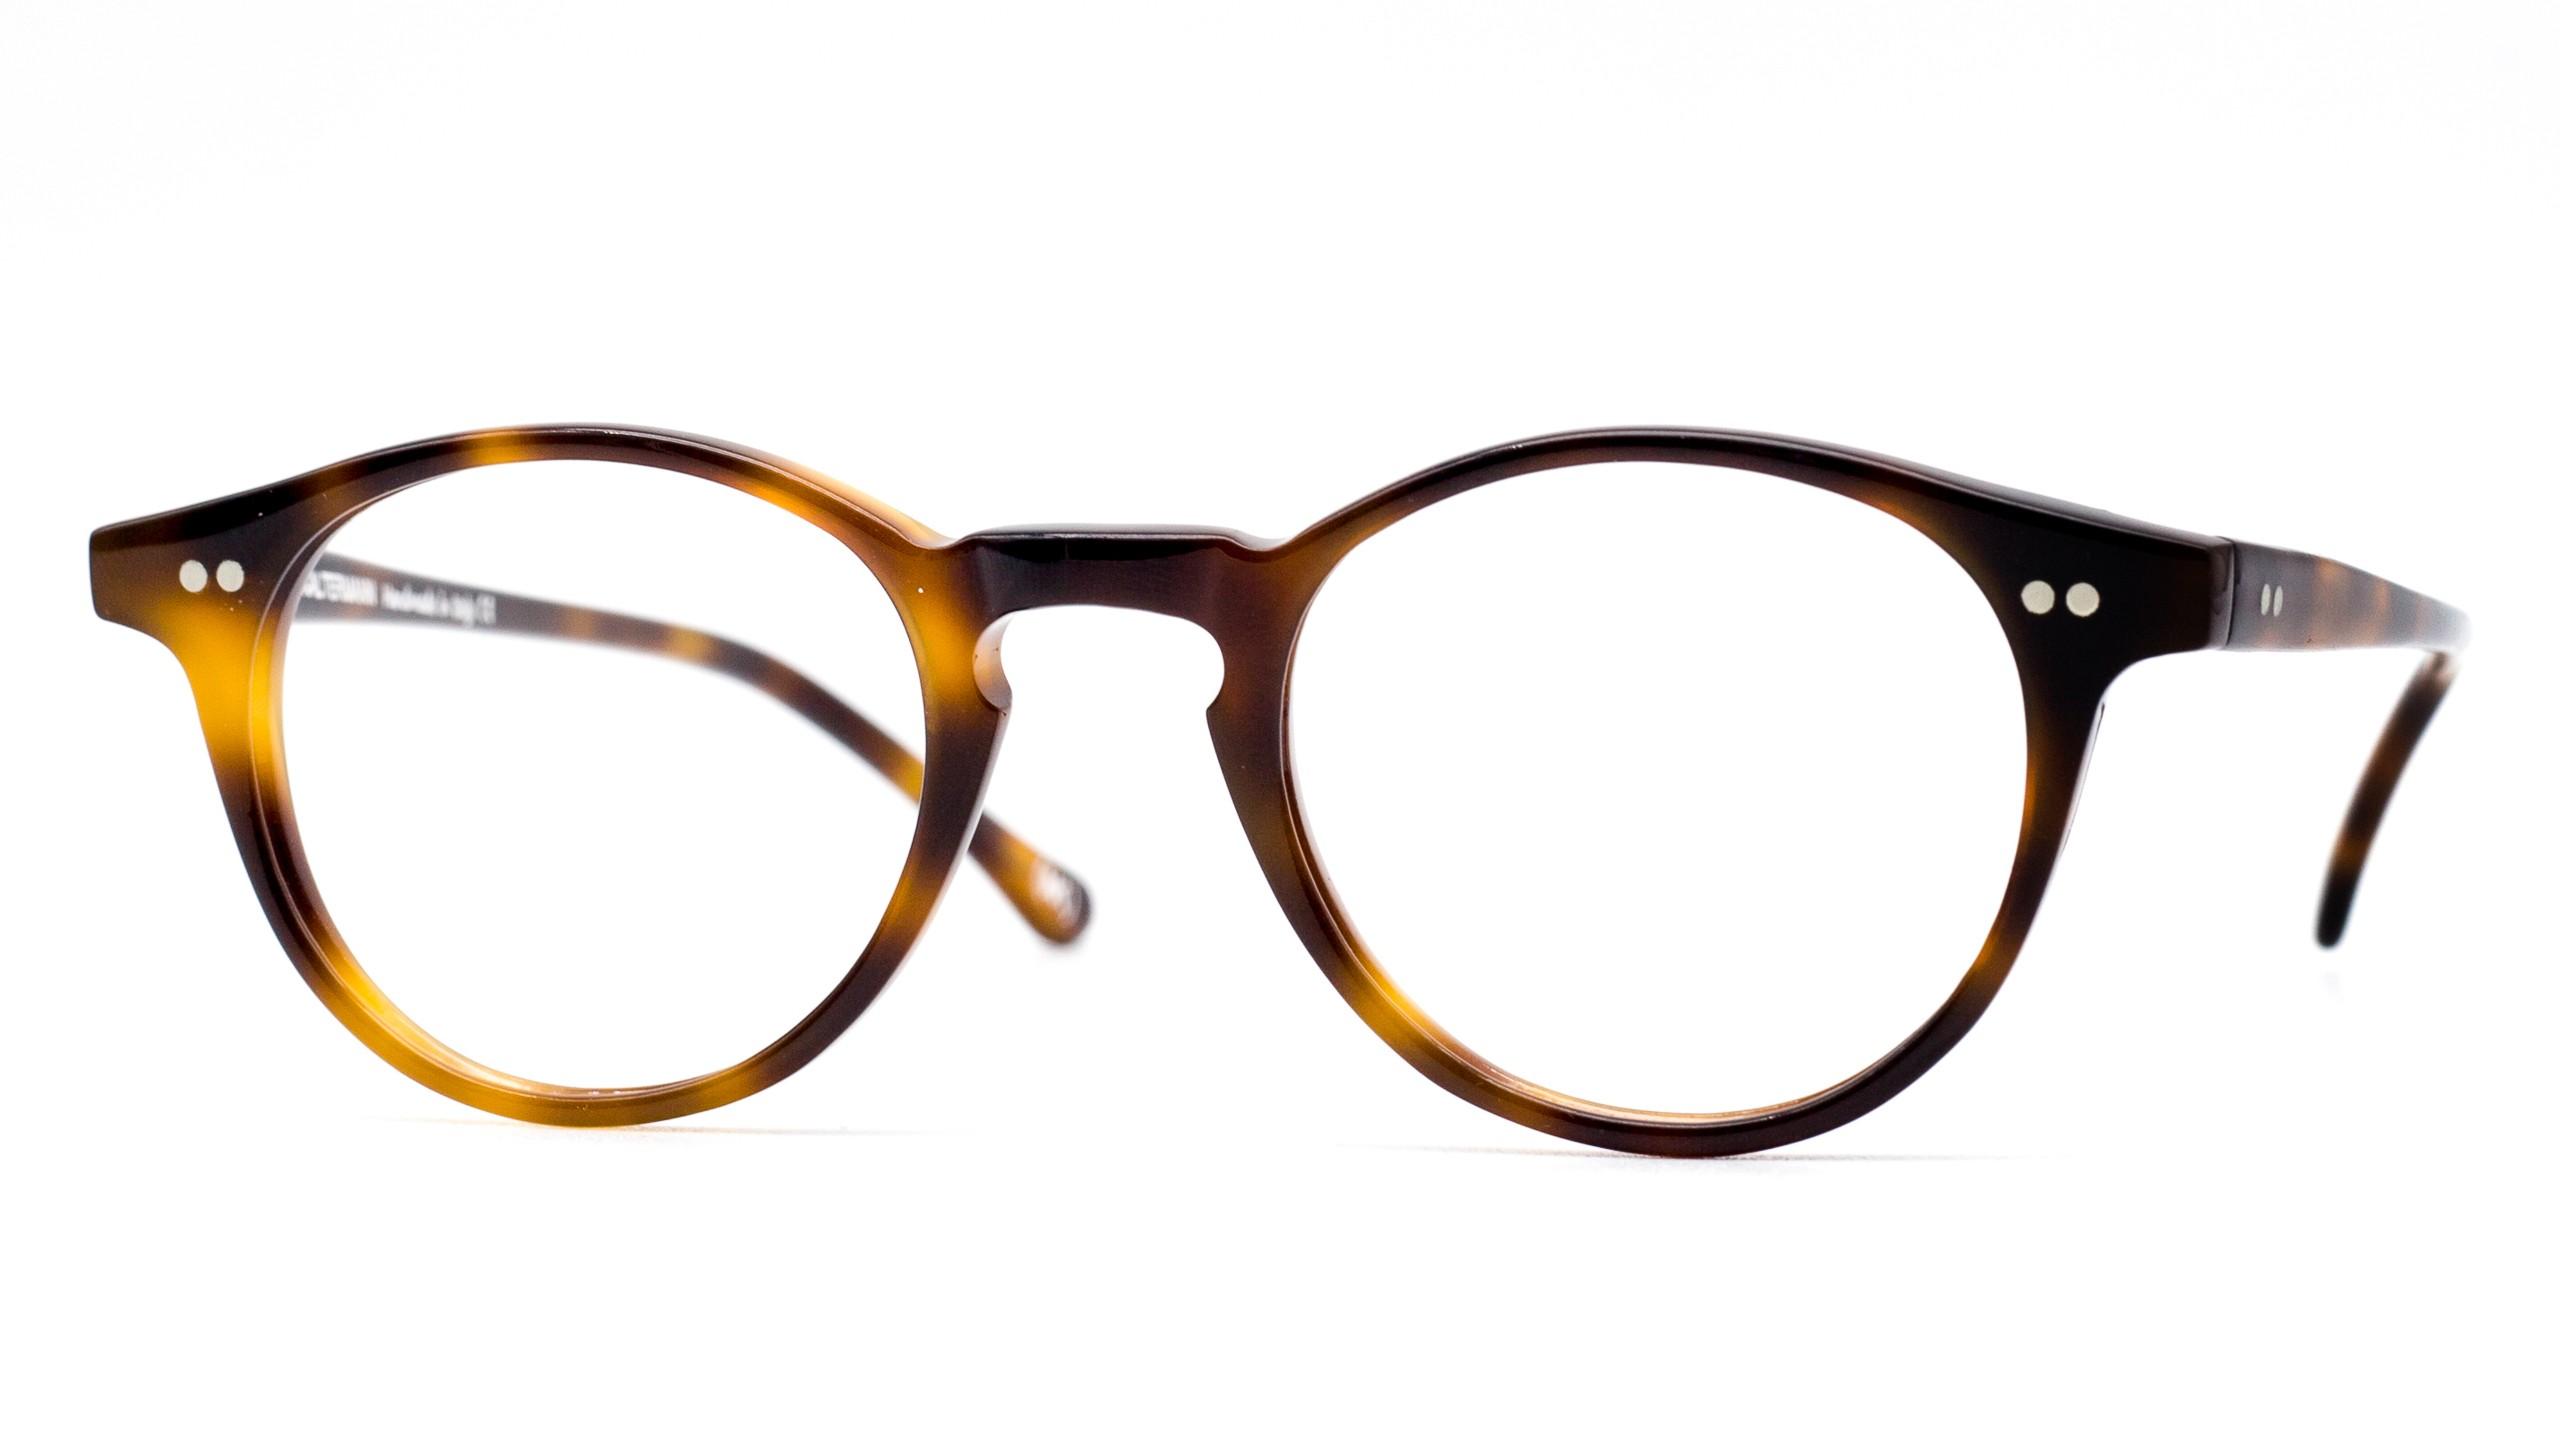 eyeglasses-Nathan-Kaltermann-made-in-Italy-Andrew-C03-Vista2